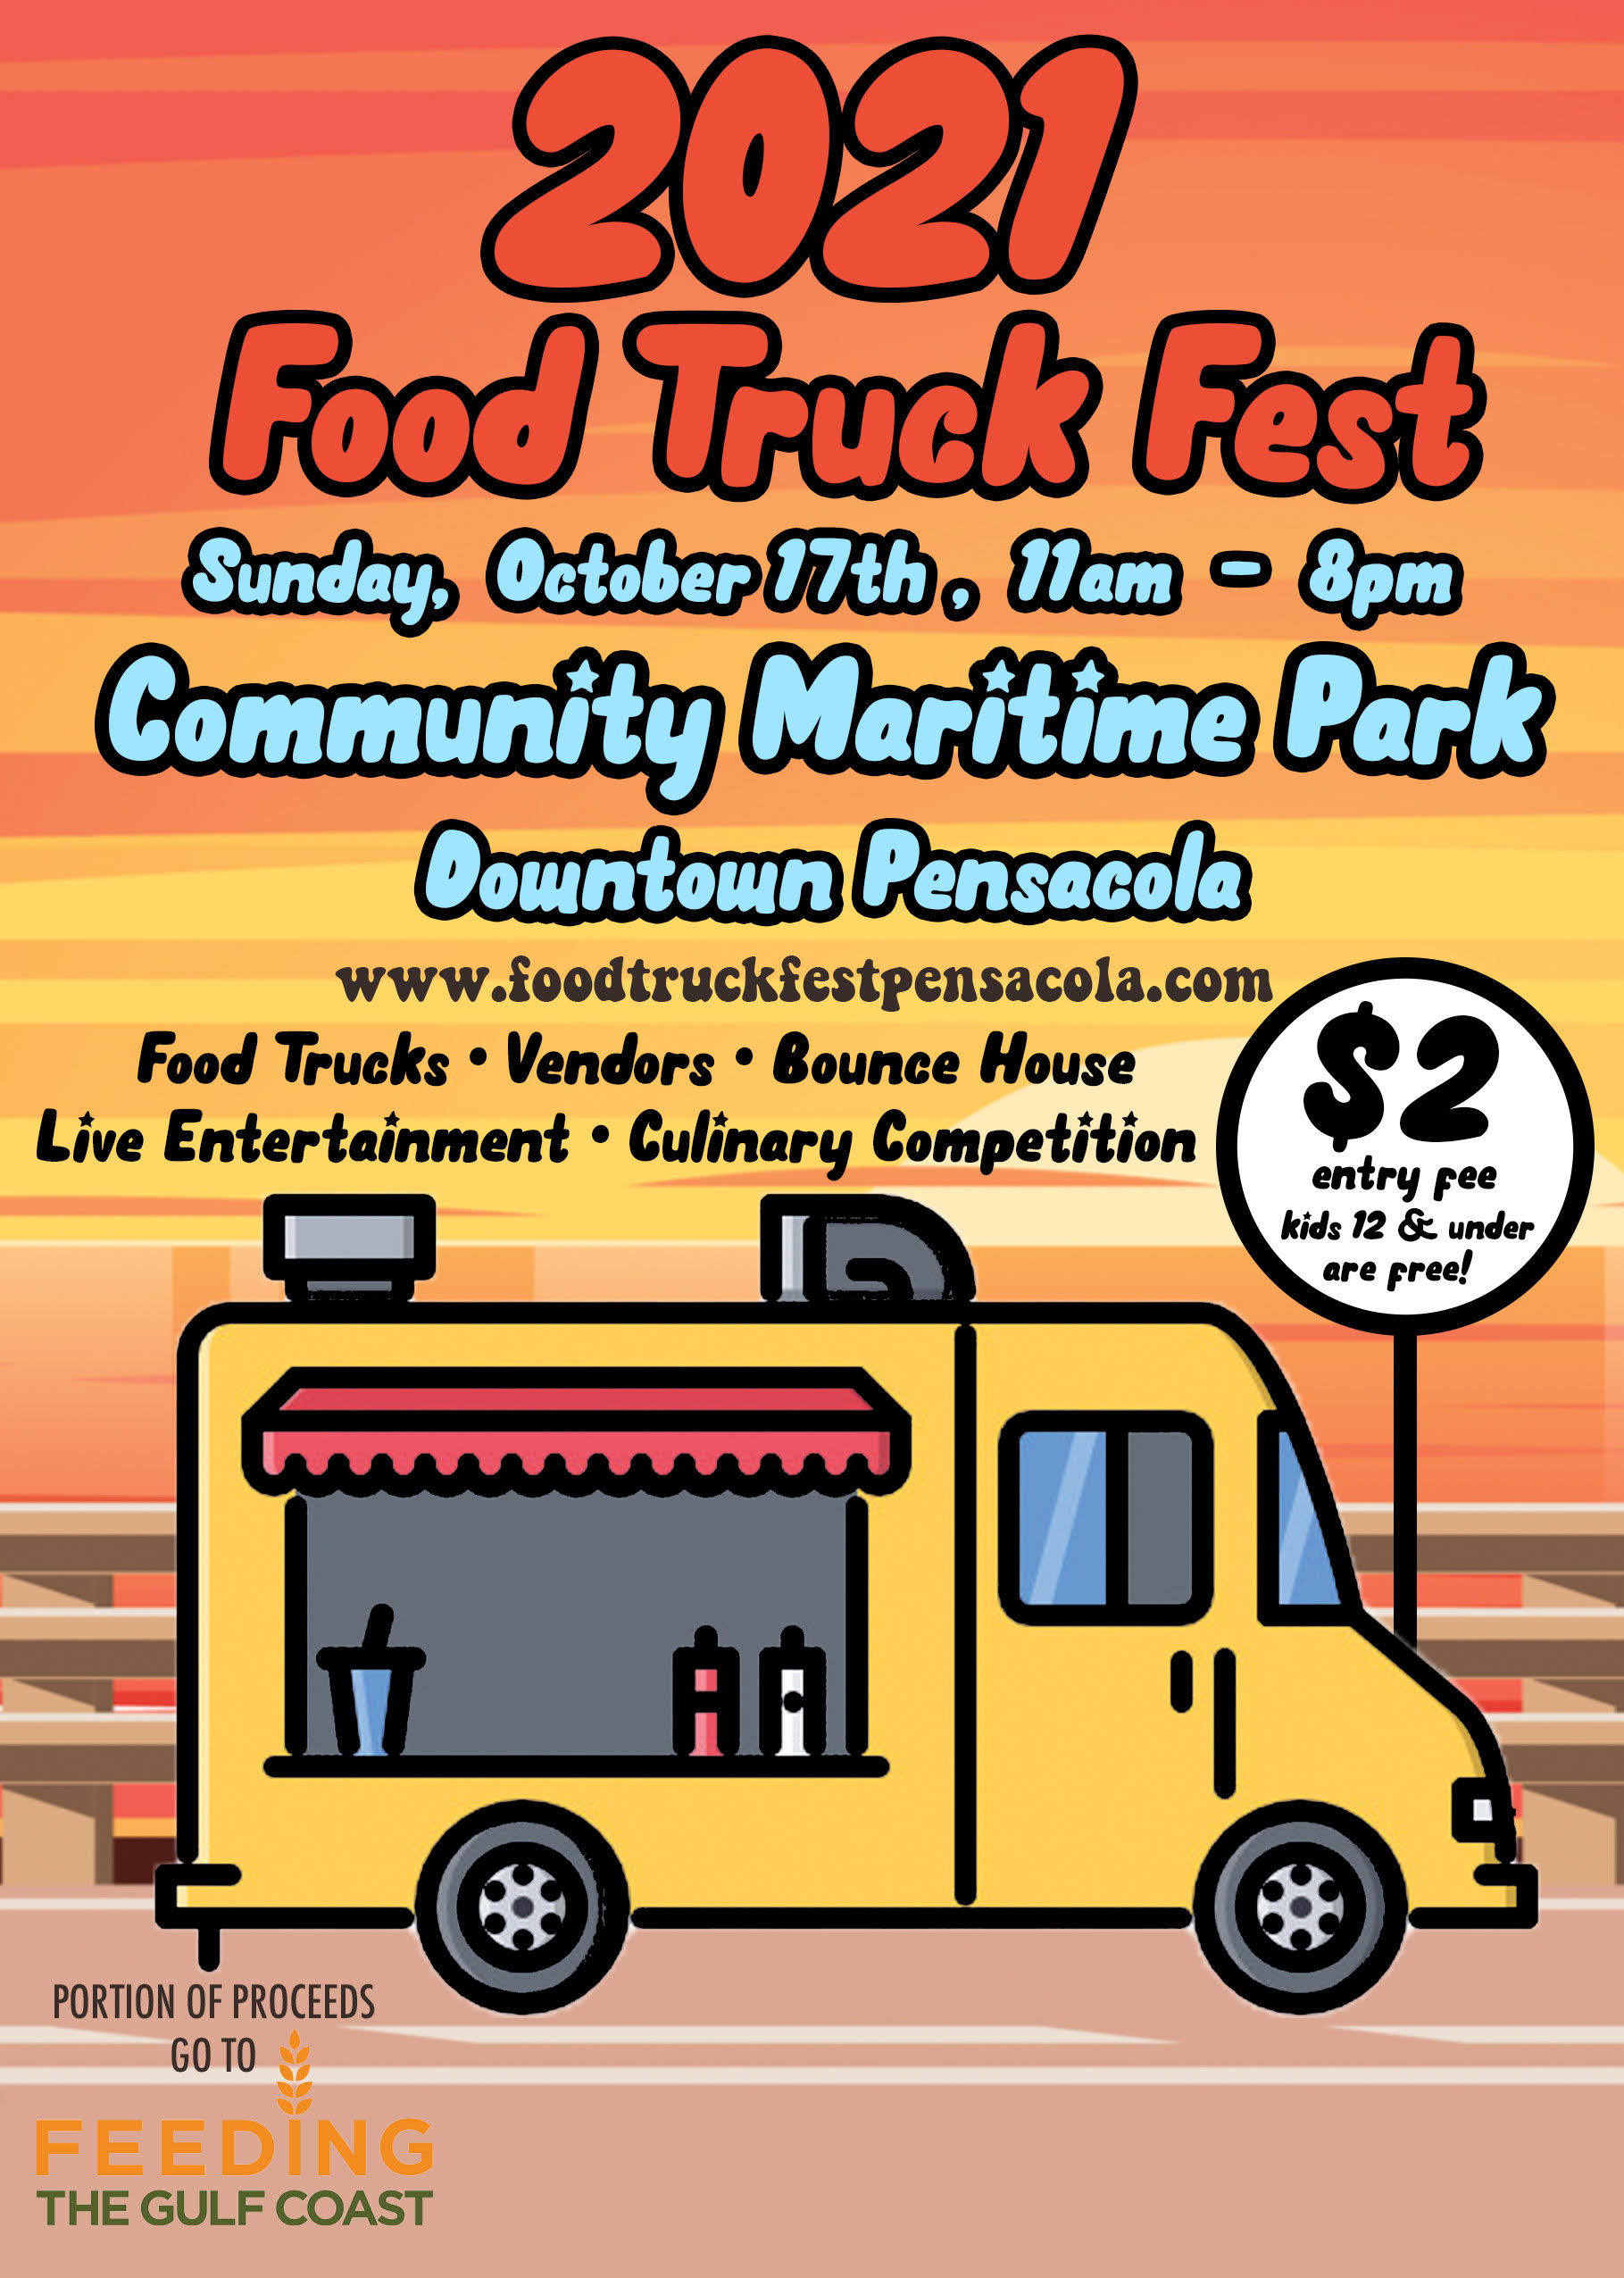 2021 Food Truck Fest